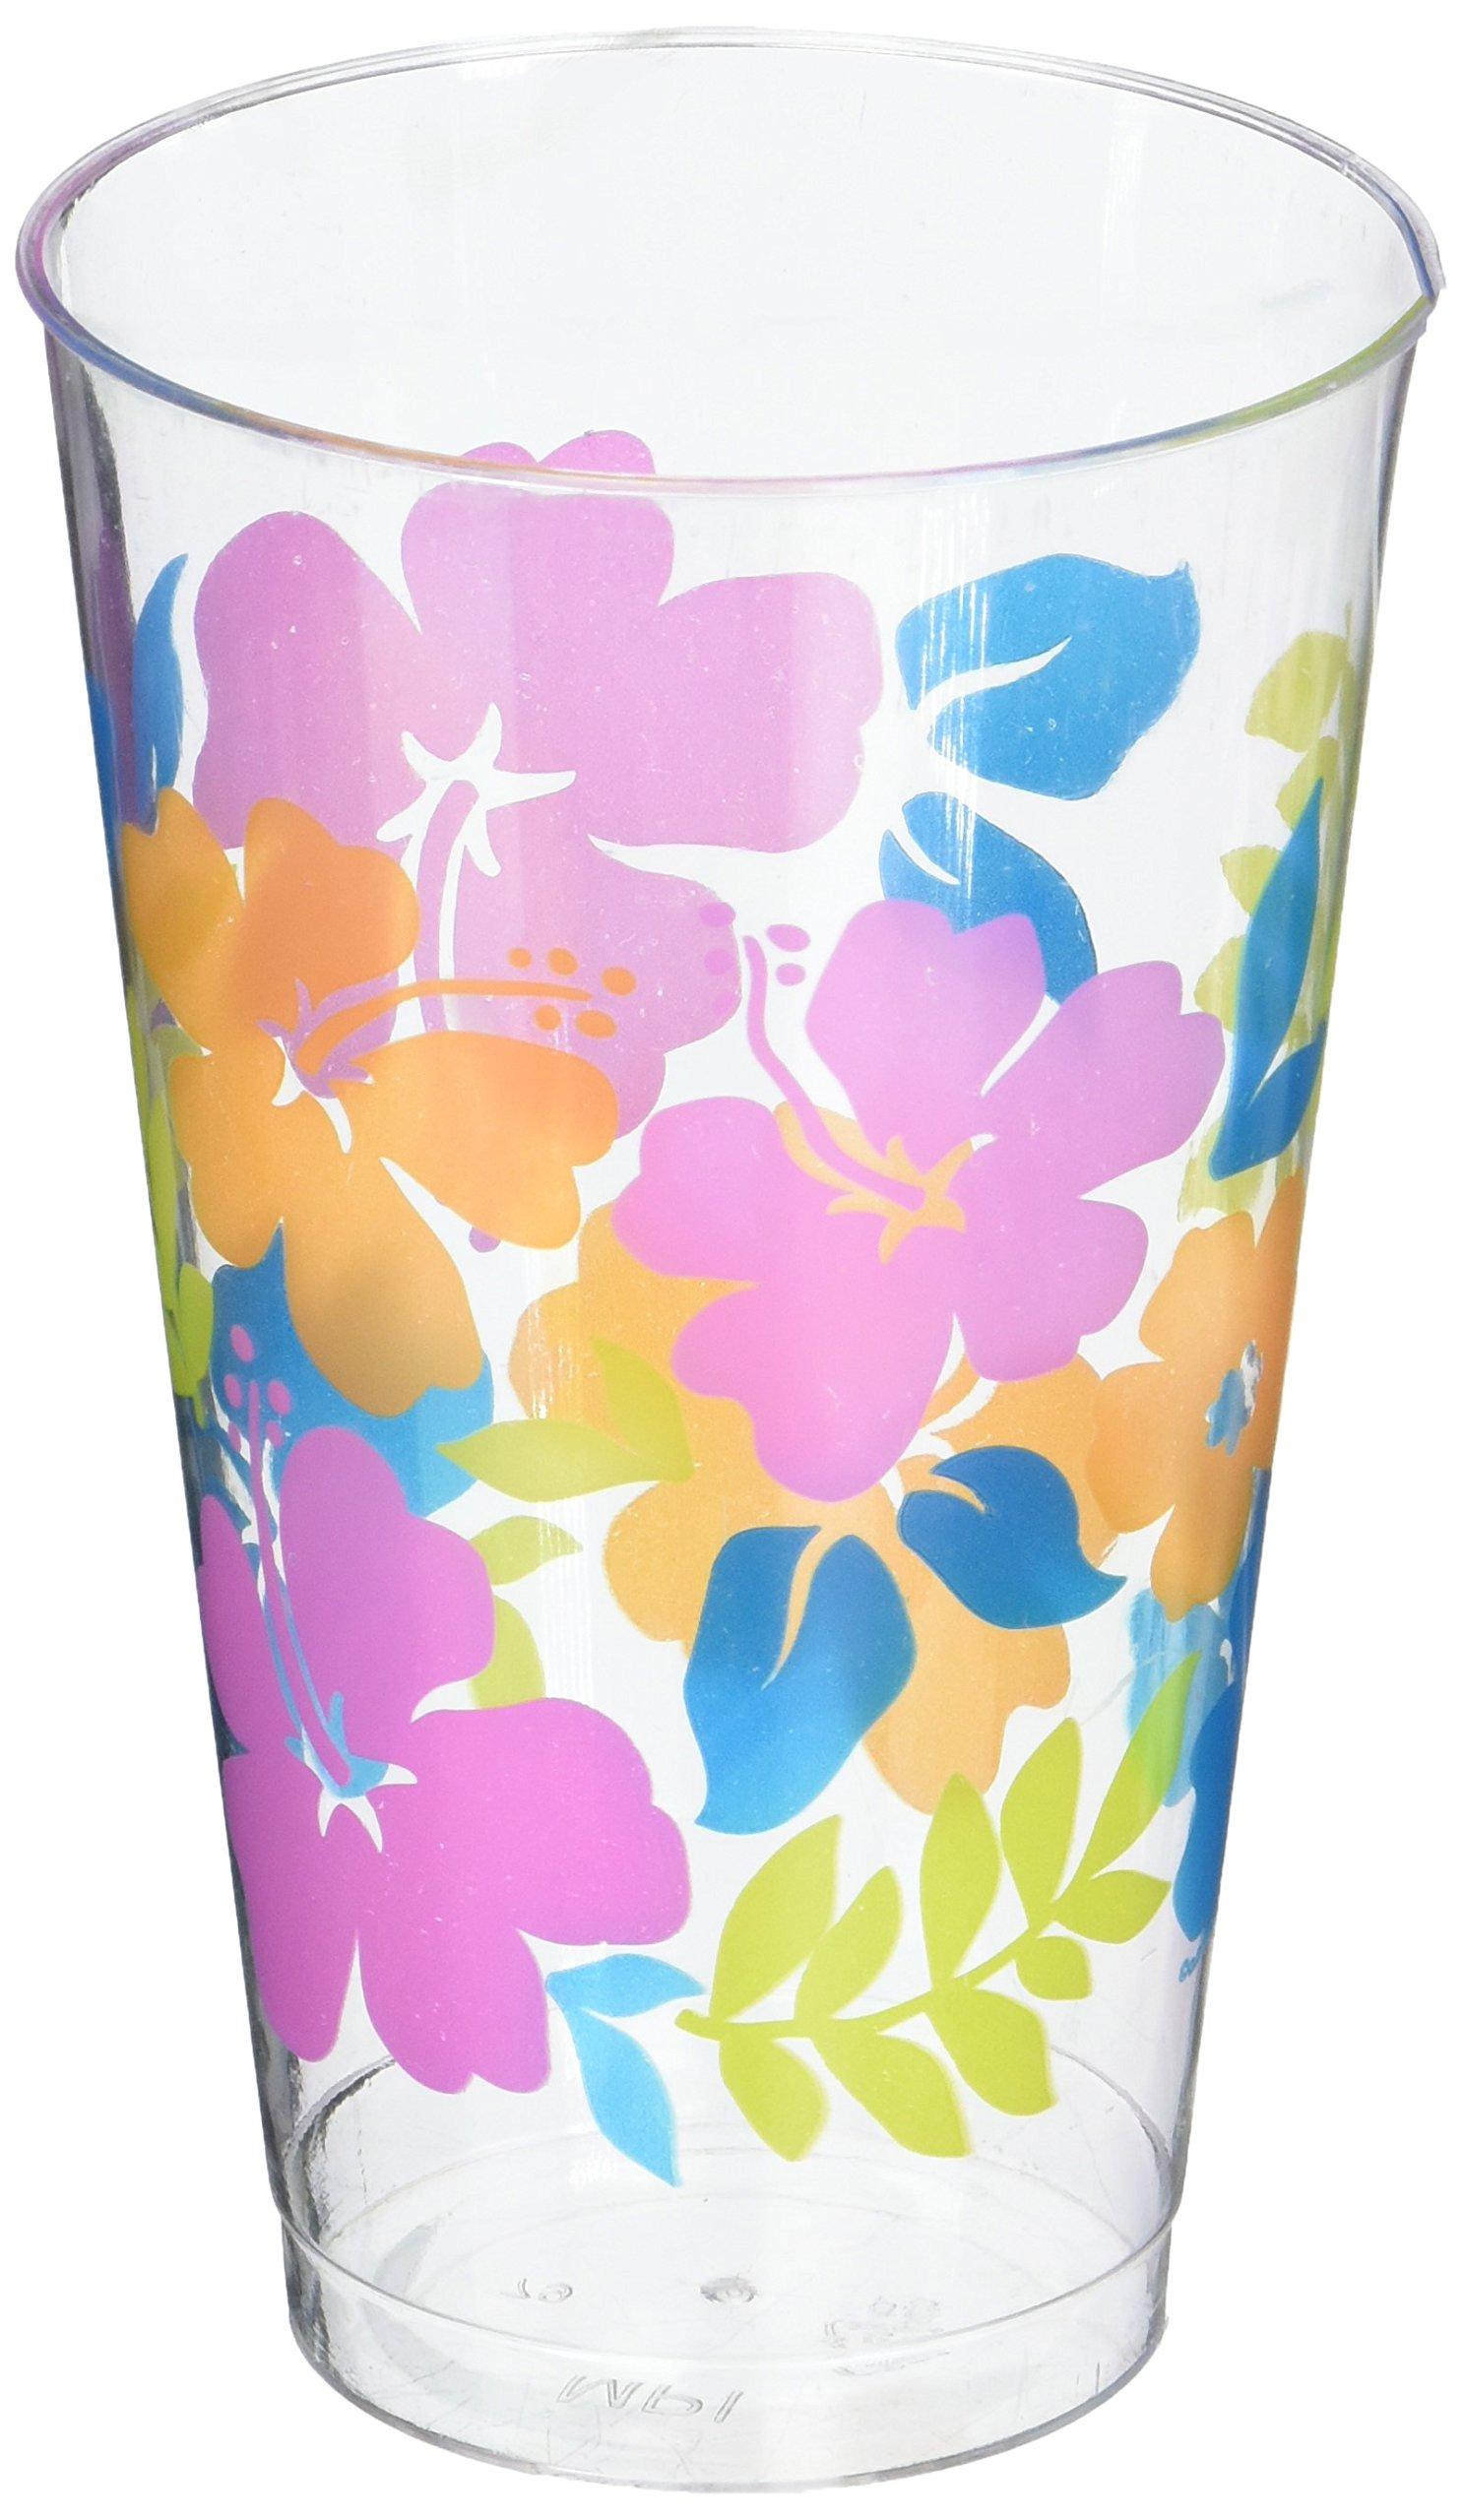 "Amscan Hawaiian Summer Luau Tropical Hibiscus Cold Drink Tumbler (25 Piece), Multi Color, 3.3 x 3.3"""